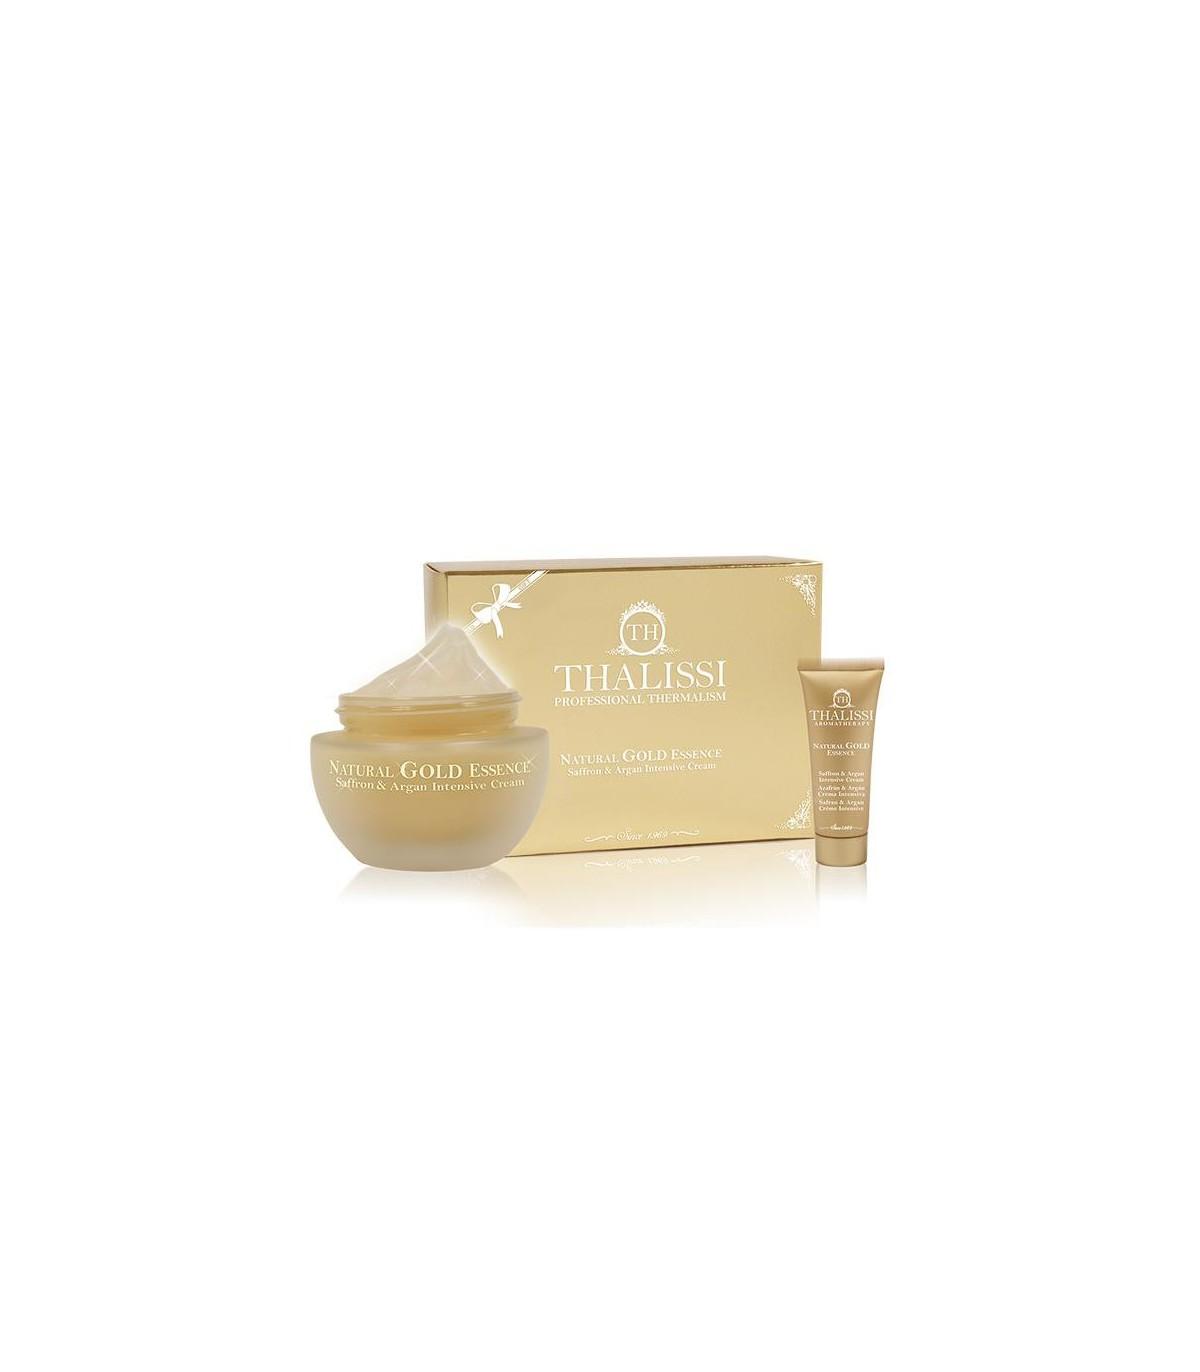 NATURAL GOLD ESSENCE Saffron & Argan. 50 ml